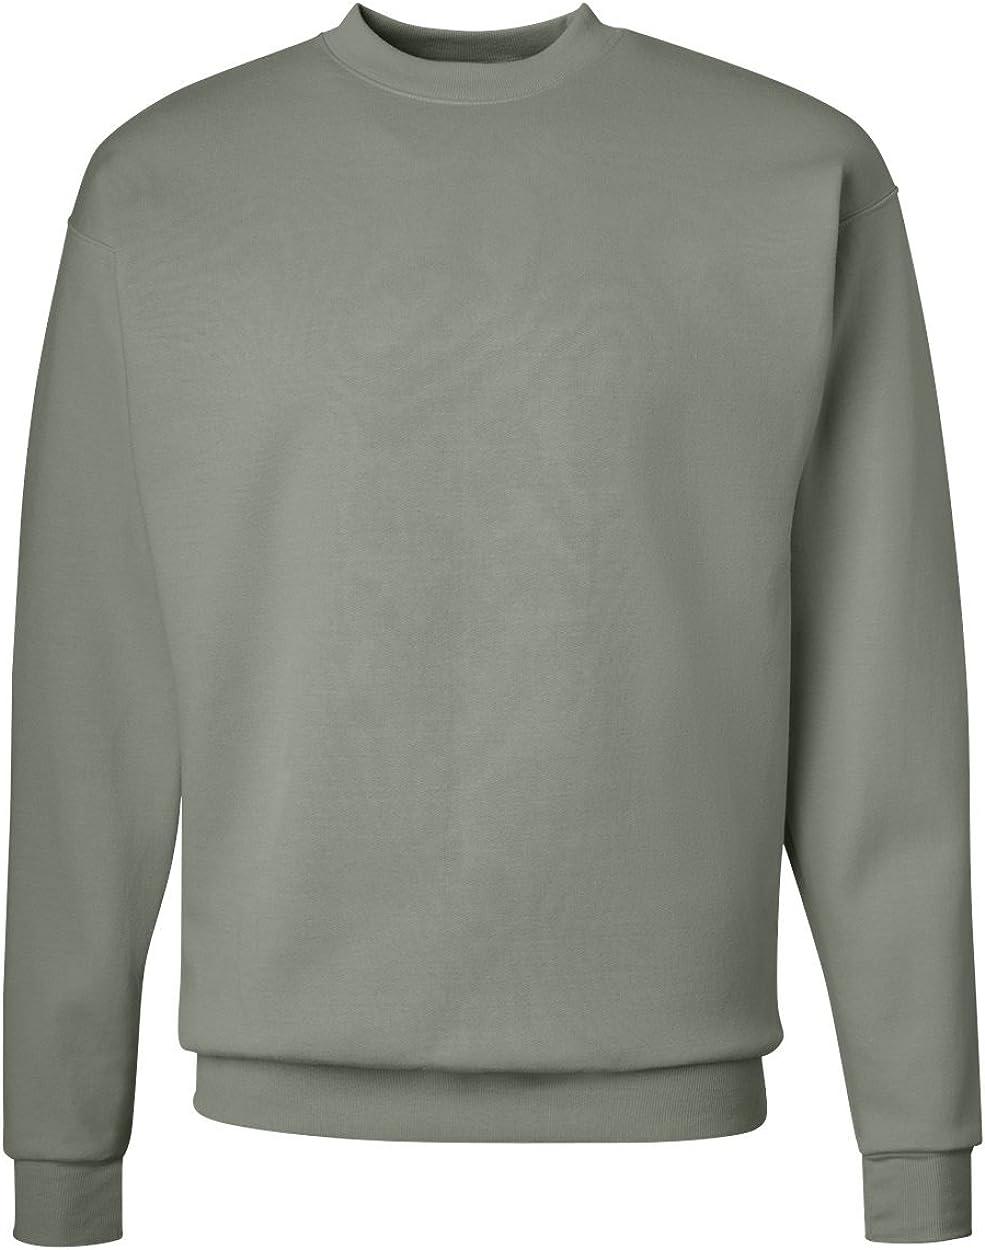 Hanes ComfortBlend EcoSmart Crewneck Sweatshirt at  Men's Clothing store